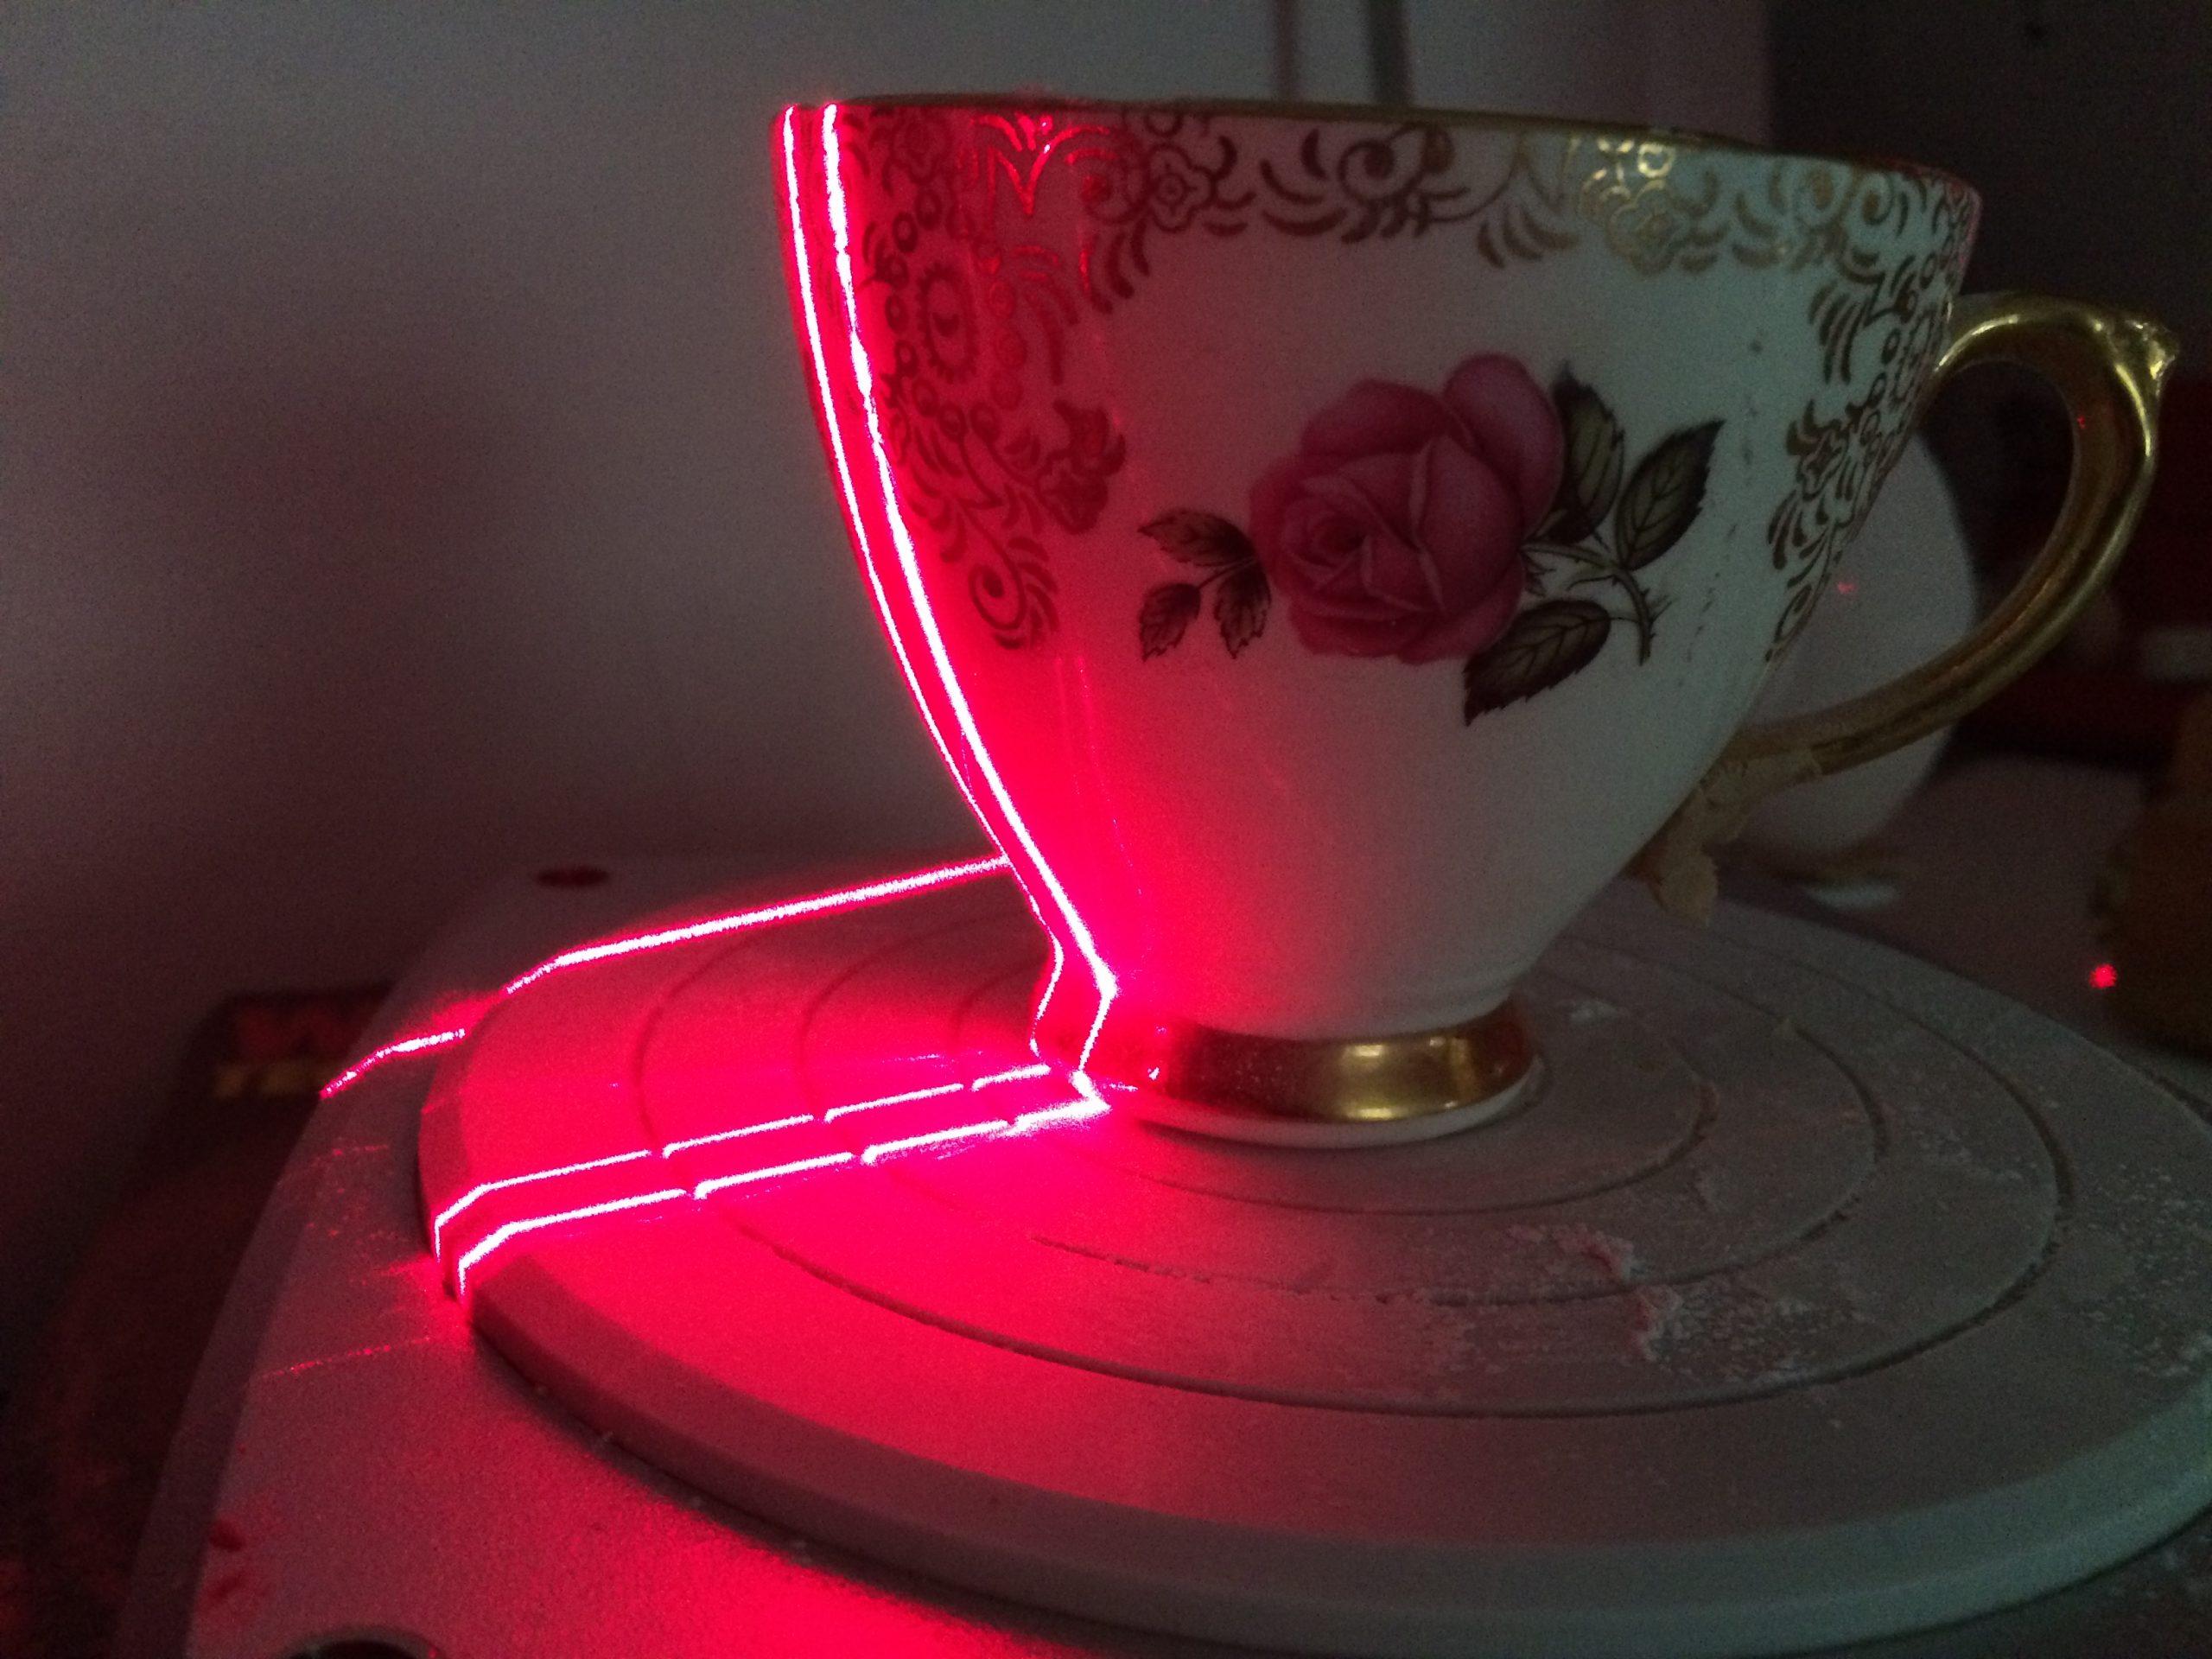 3D scanning of tea cup by Housto, Texas sculptor Bridgette Mongeon